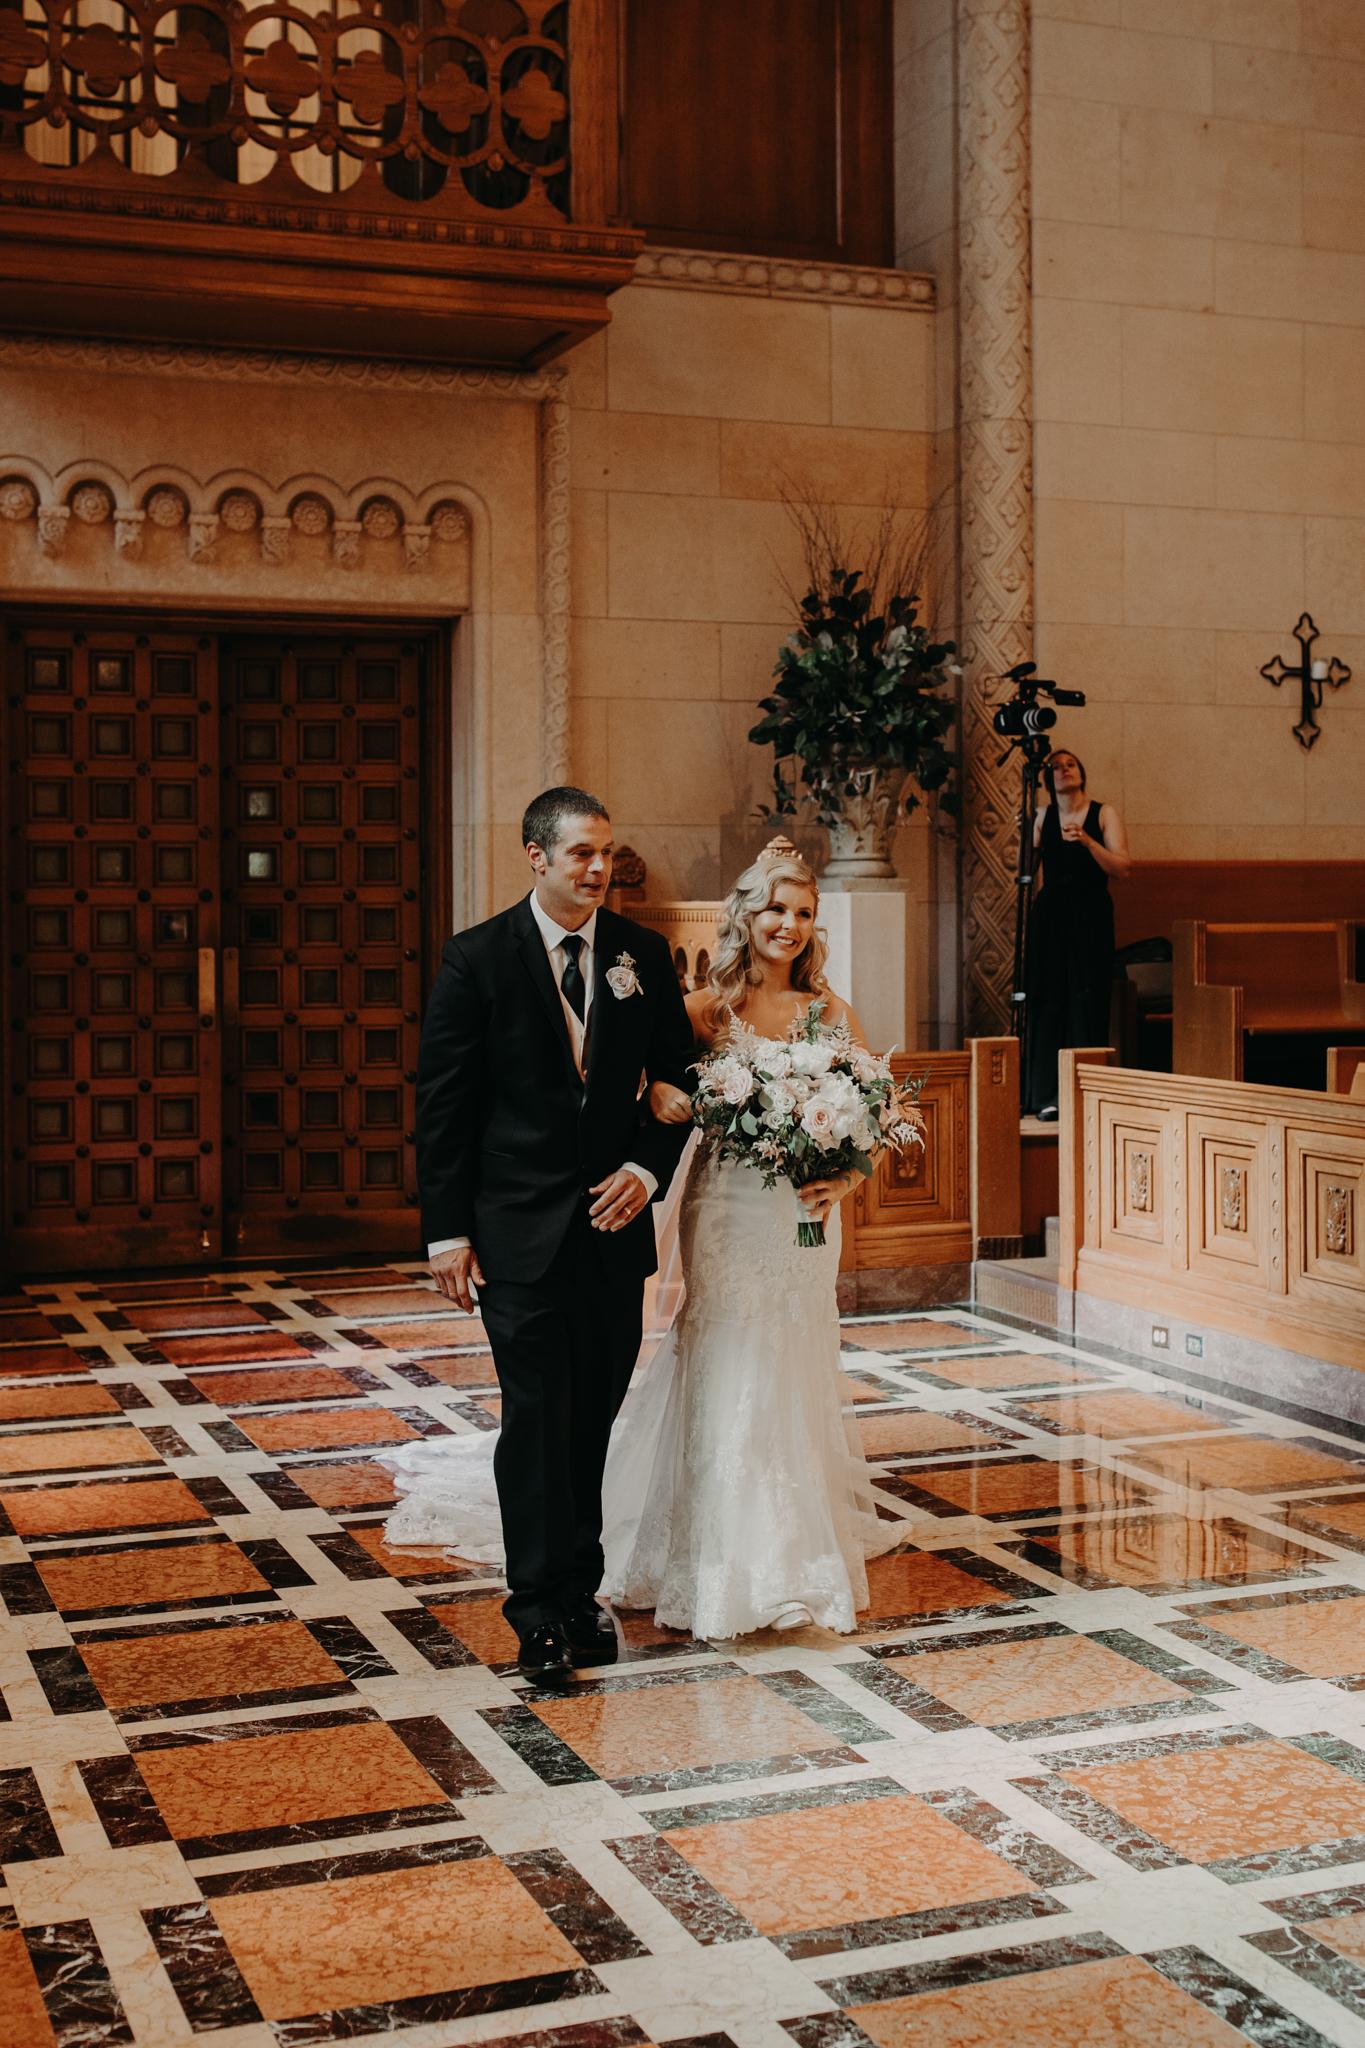 The-Inn-At-St-Johns-Wedding-35.jpg